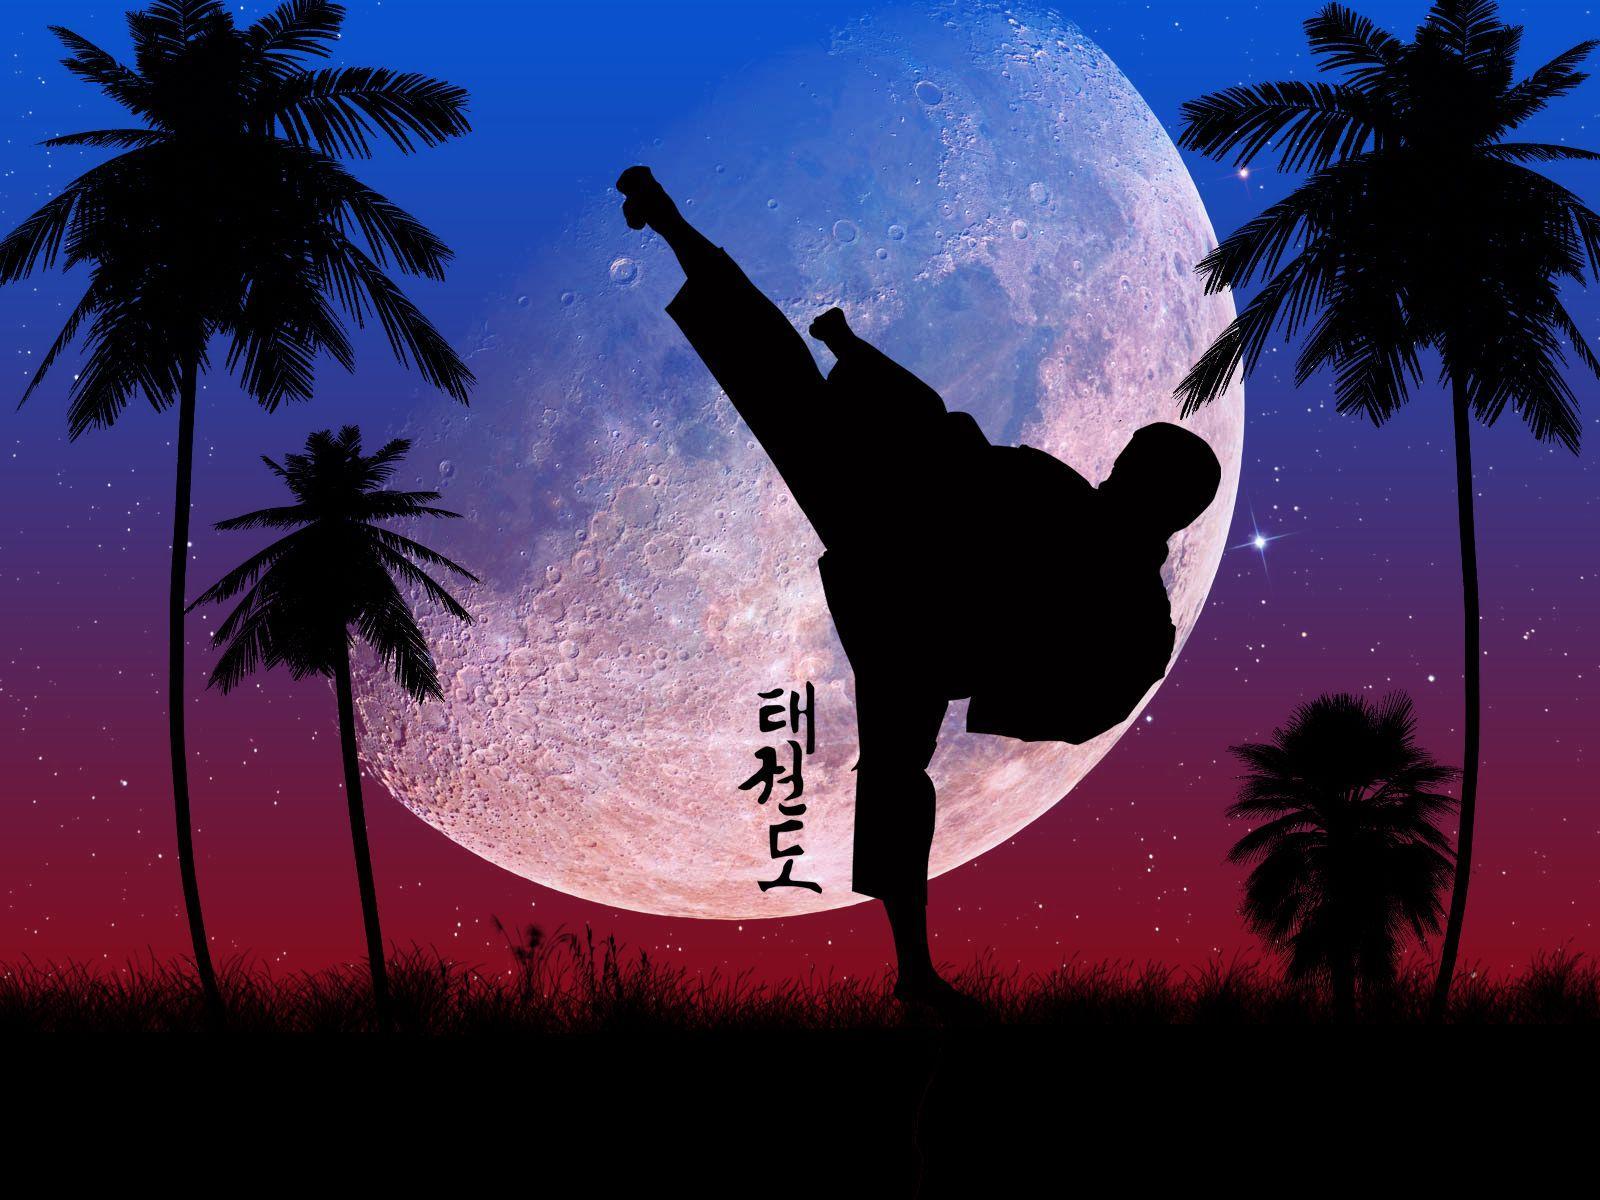 Taekwondo HD Wallpapers - Wallpaper Cave